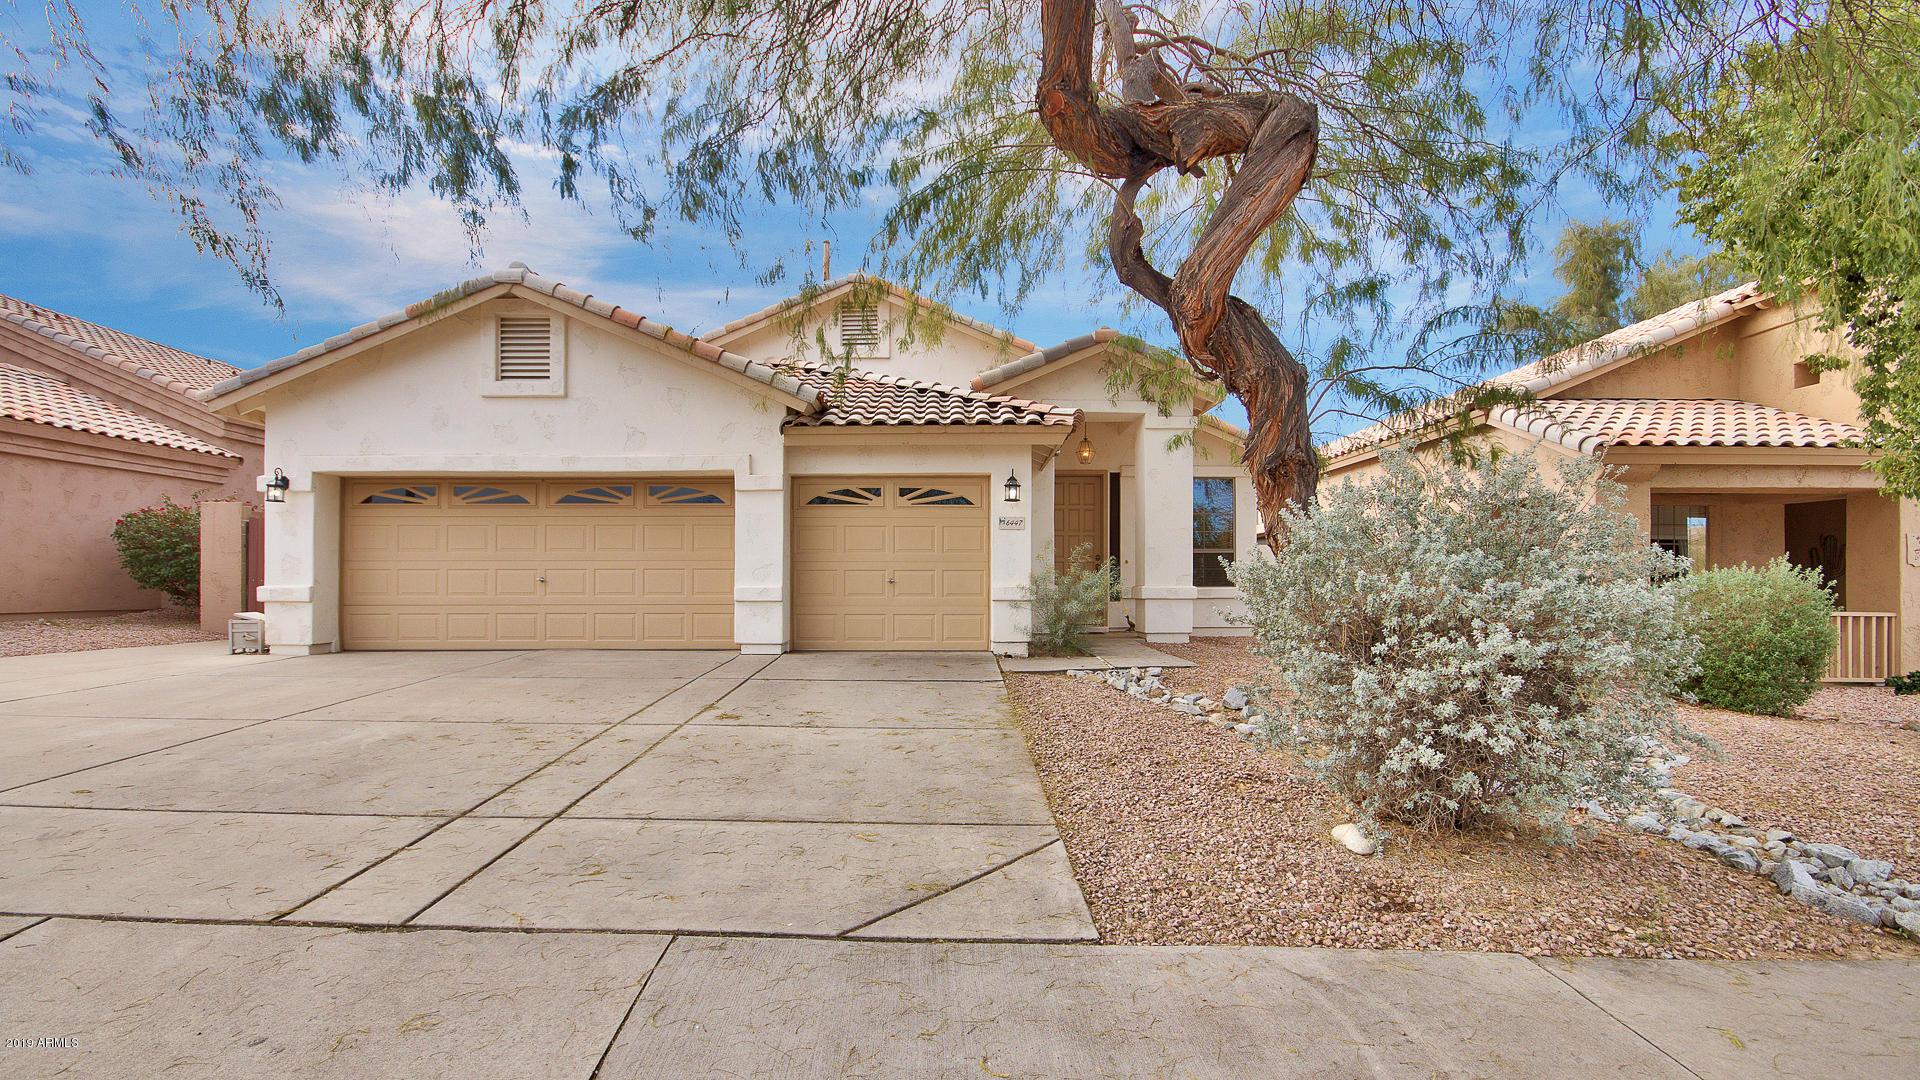 Photo of 6447 E SIERRA MORENA Street, Mesa, AZ 85215